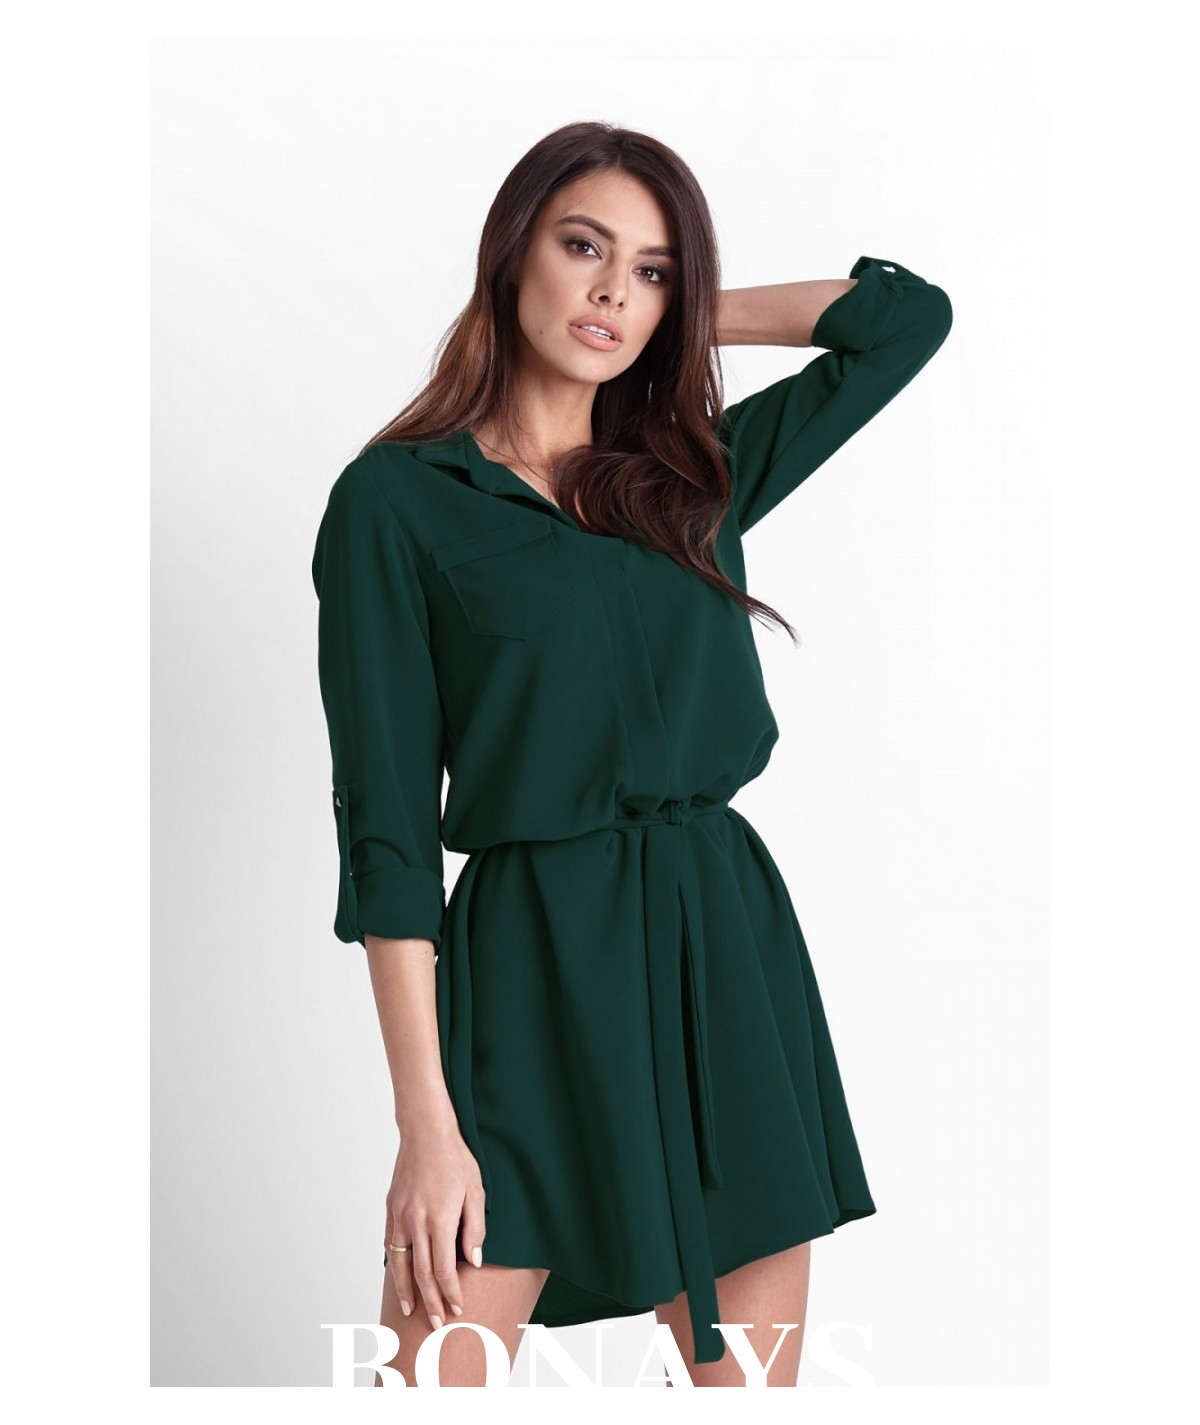 koszulowa sukienka damska, rozkloszowana wiosenna